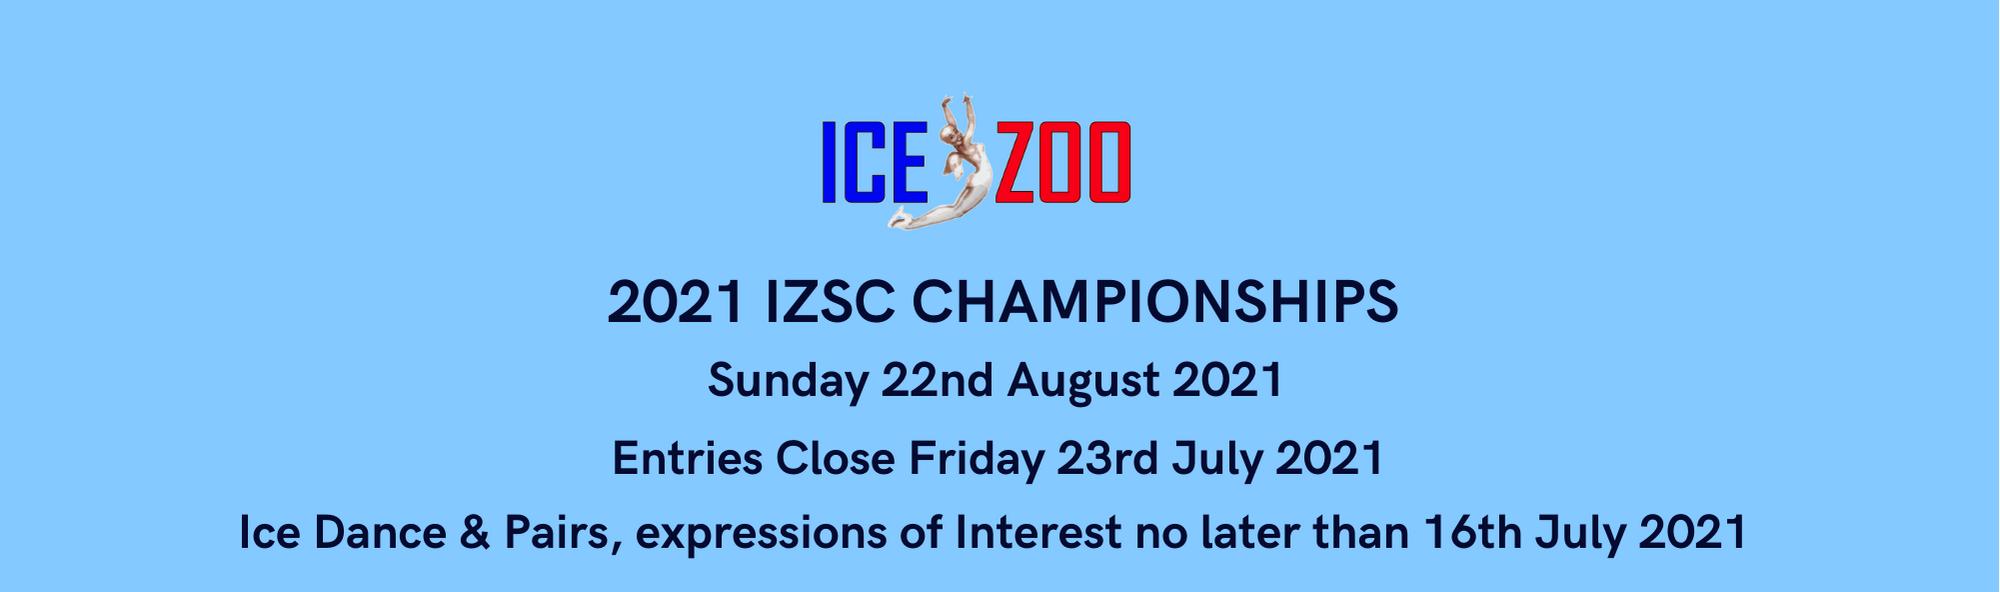 IZSC Championships